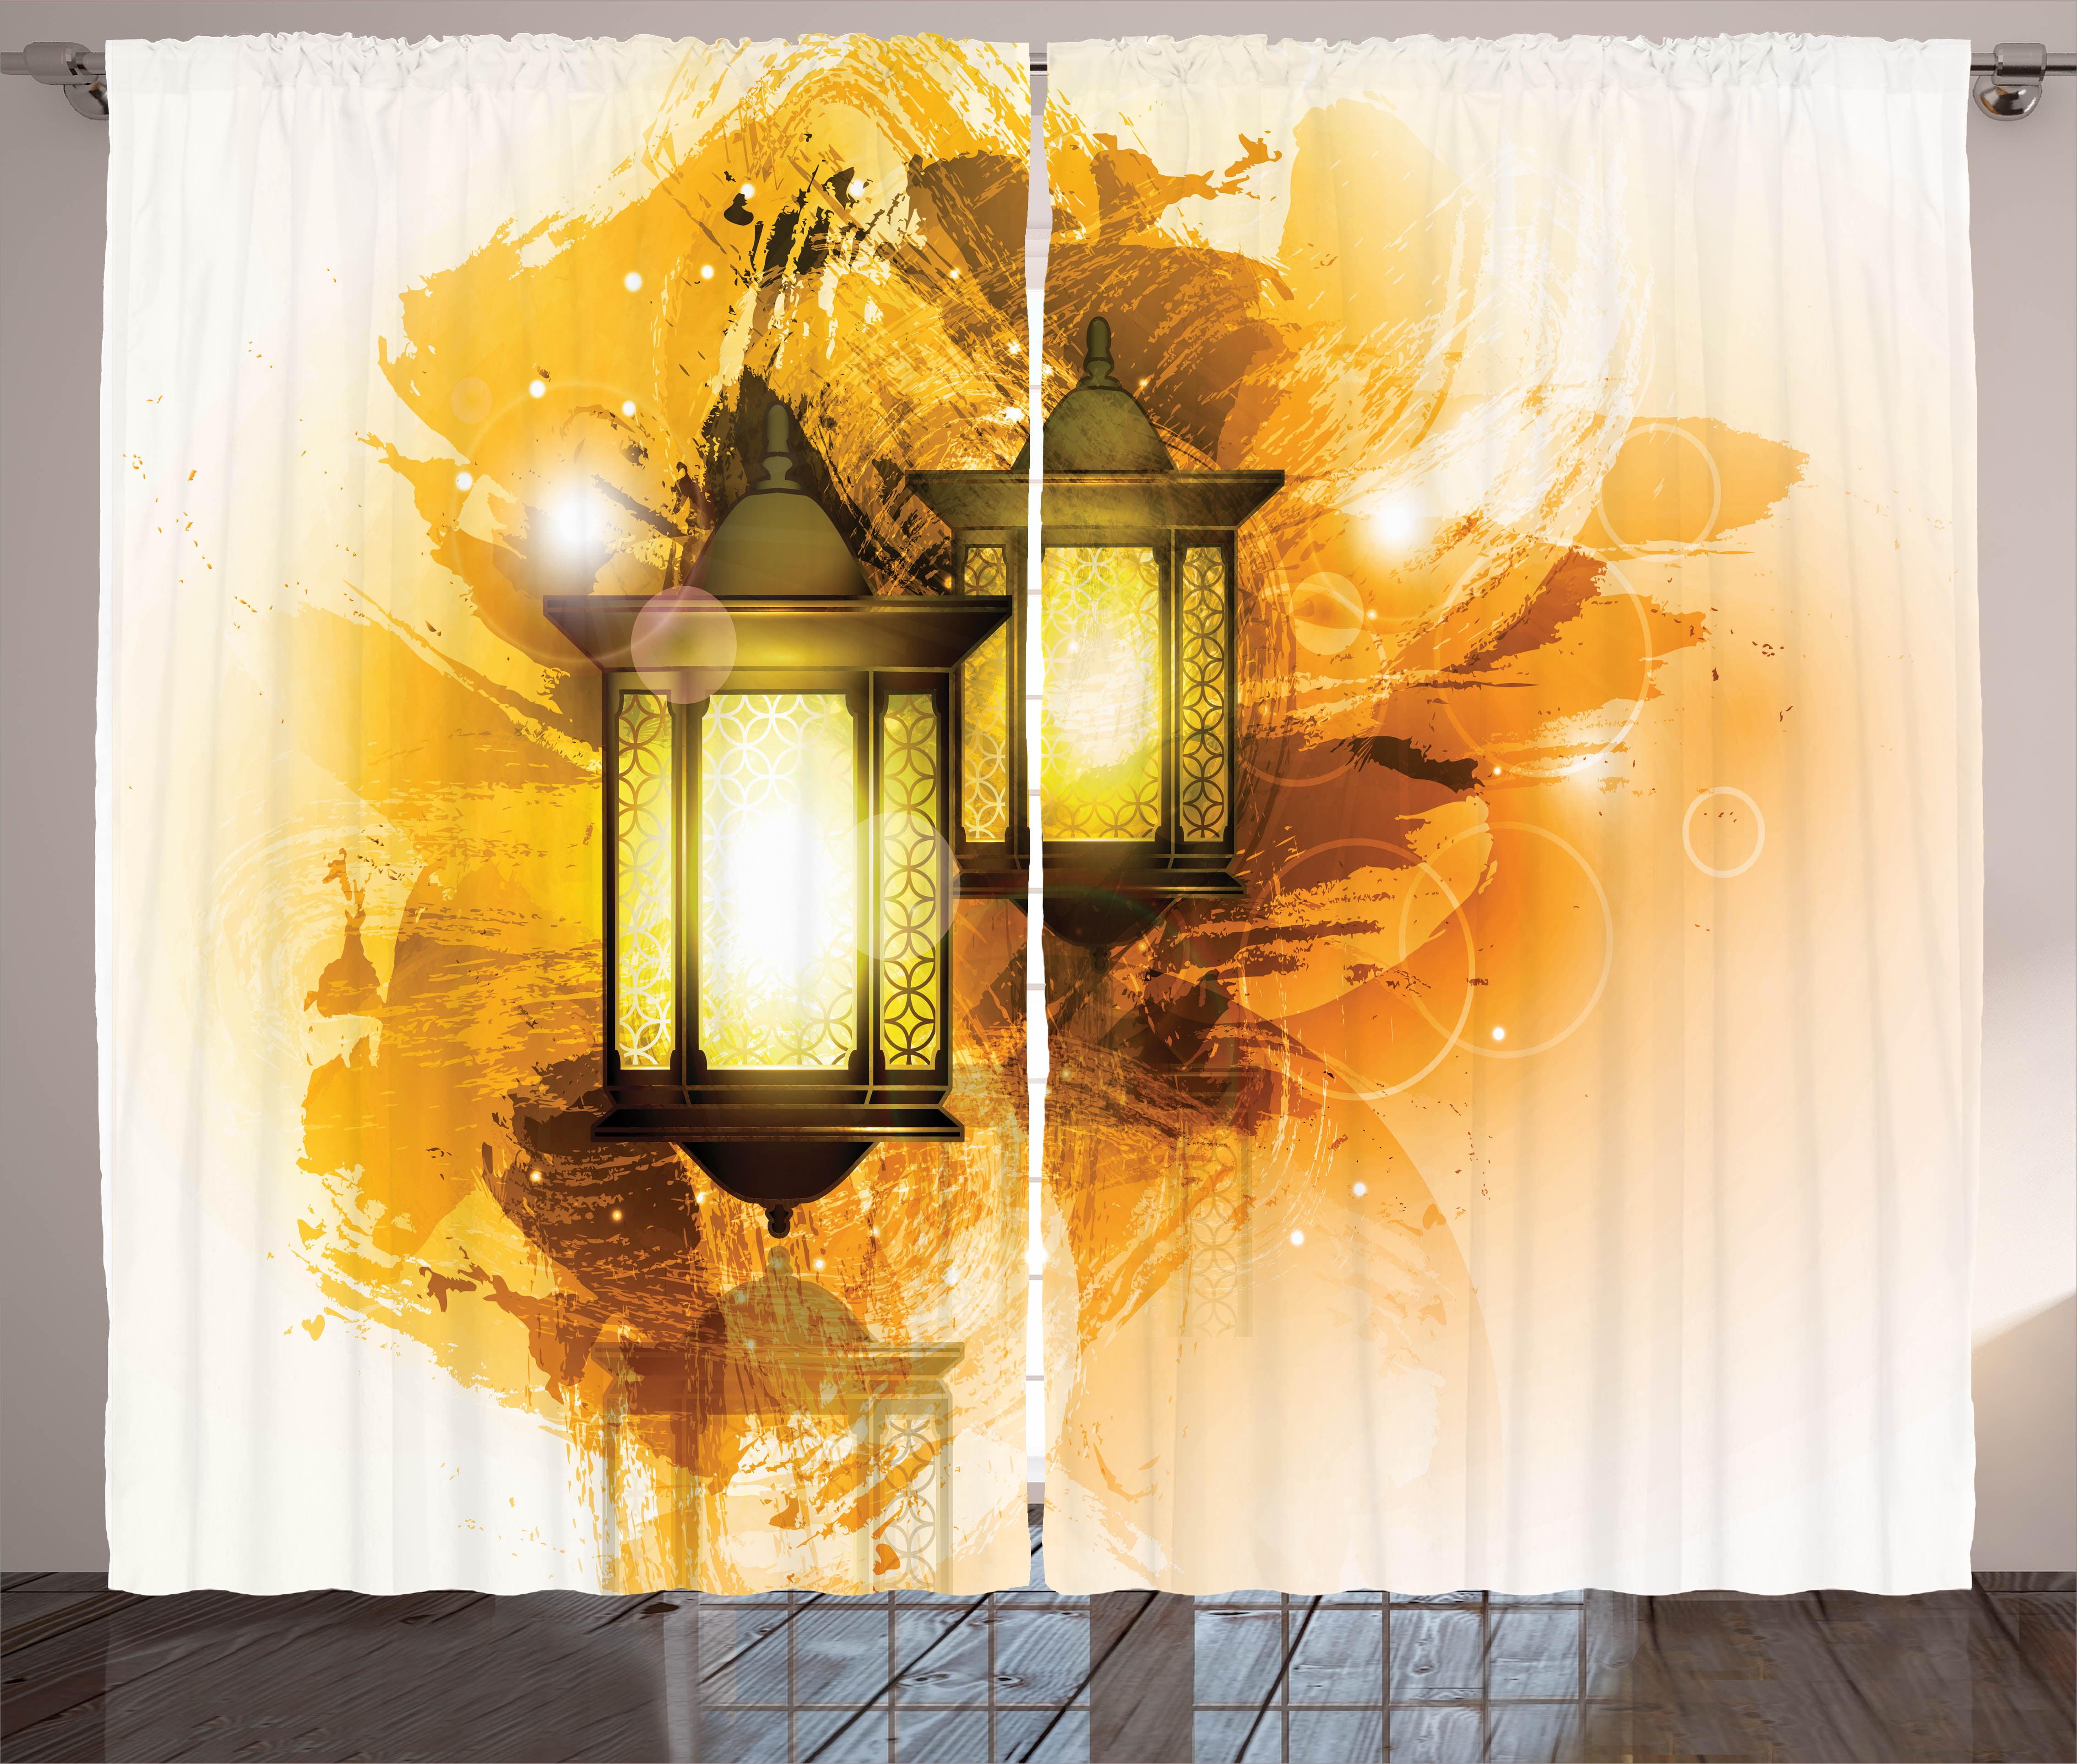 Arabesque Curtains 2 Panels Set, Urban Ramadan Kareem Lanterns Antique Islamic... by Kozmos